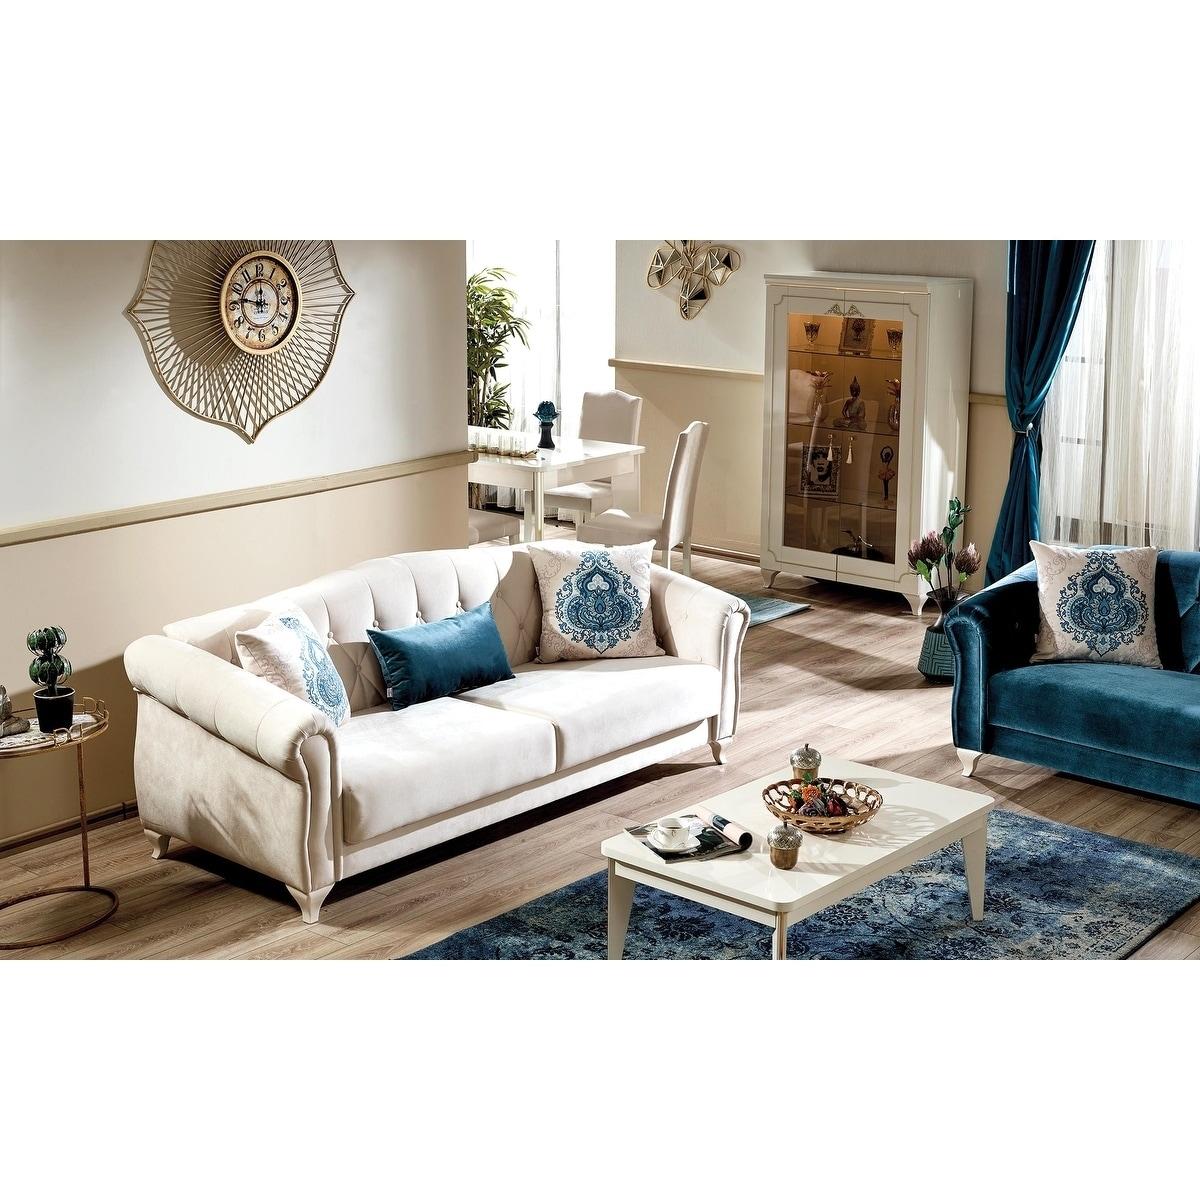 Melis Convertible Sofa Sleeper ( Ivory White)